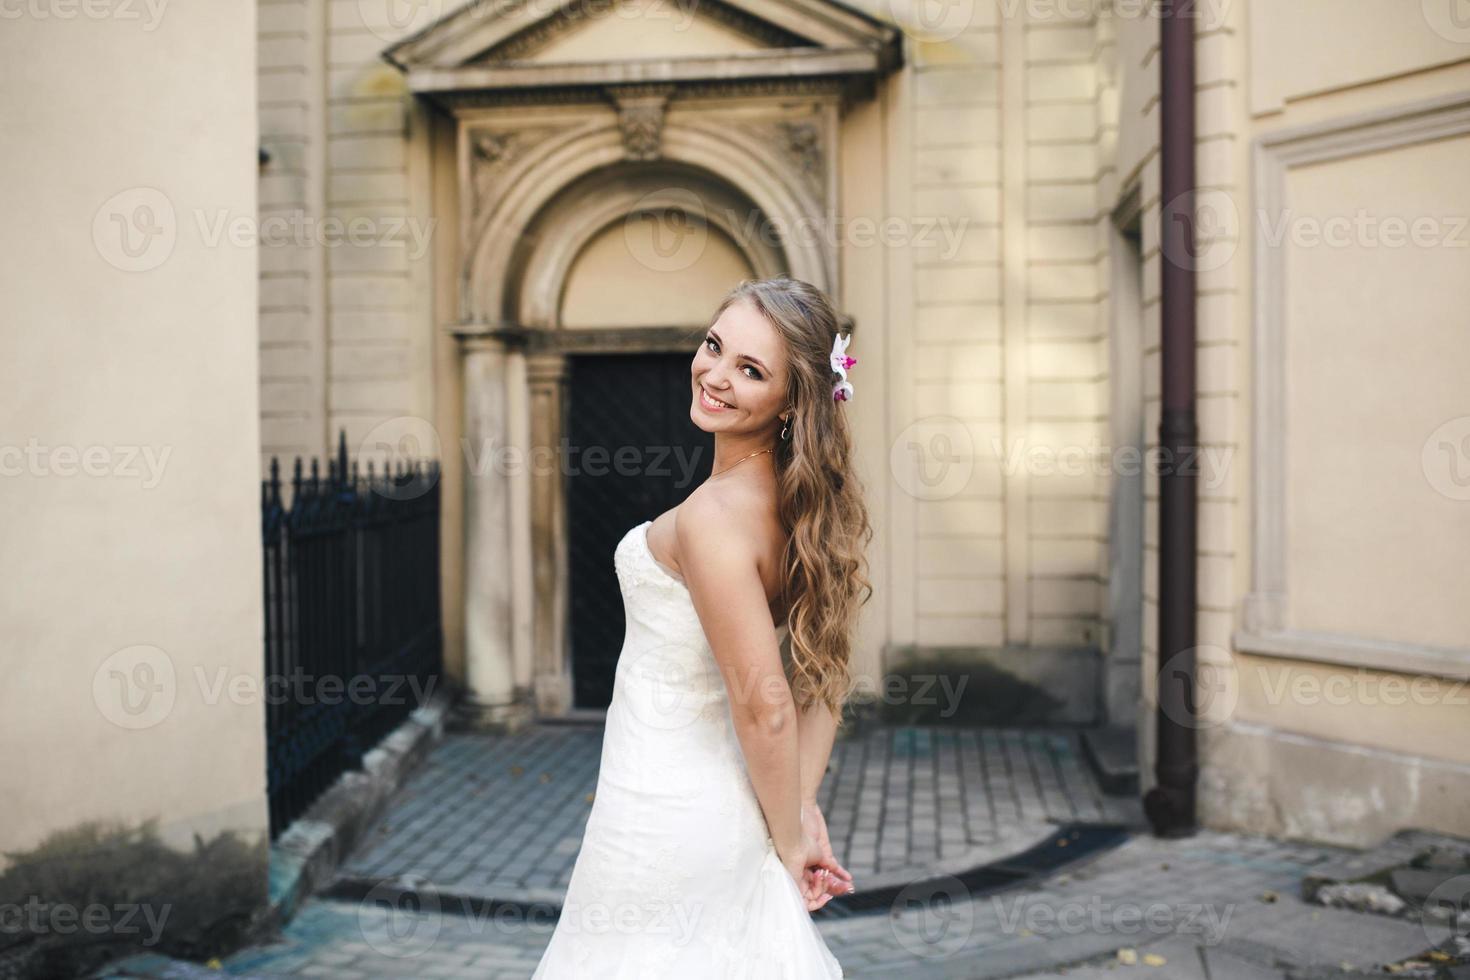 Beautiful bride posing photo